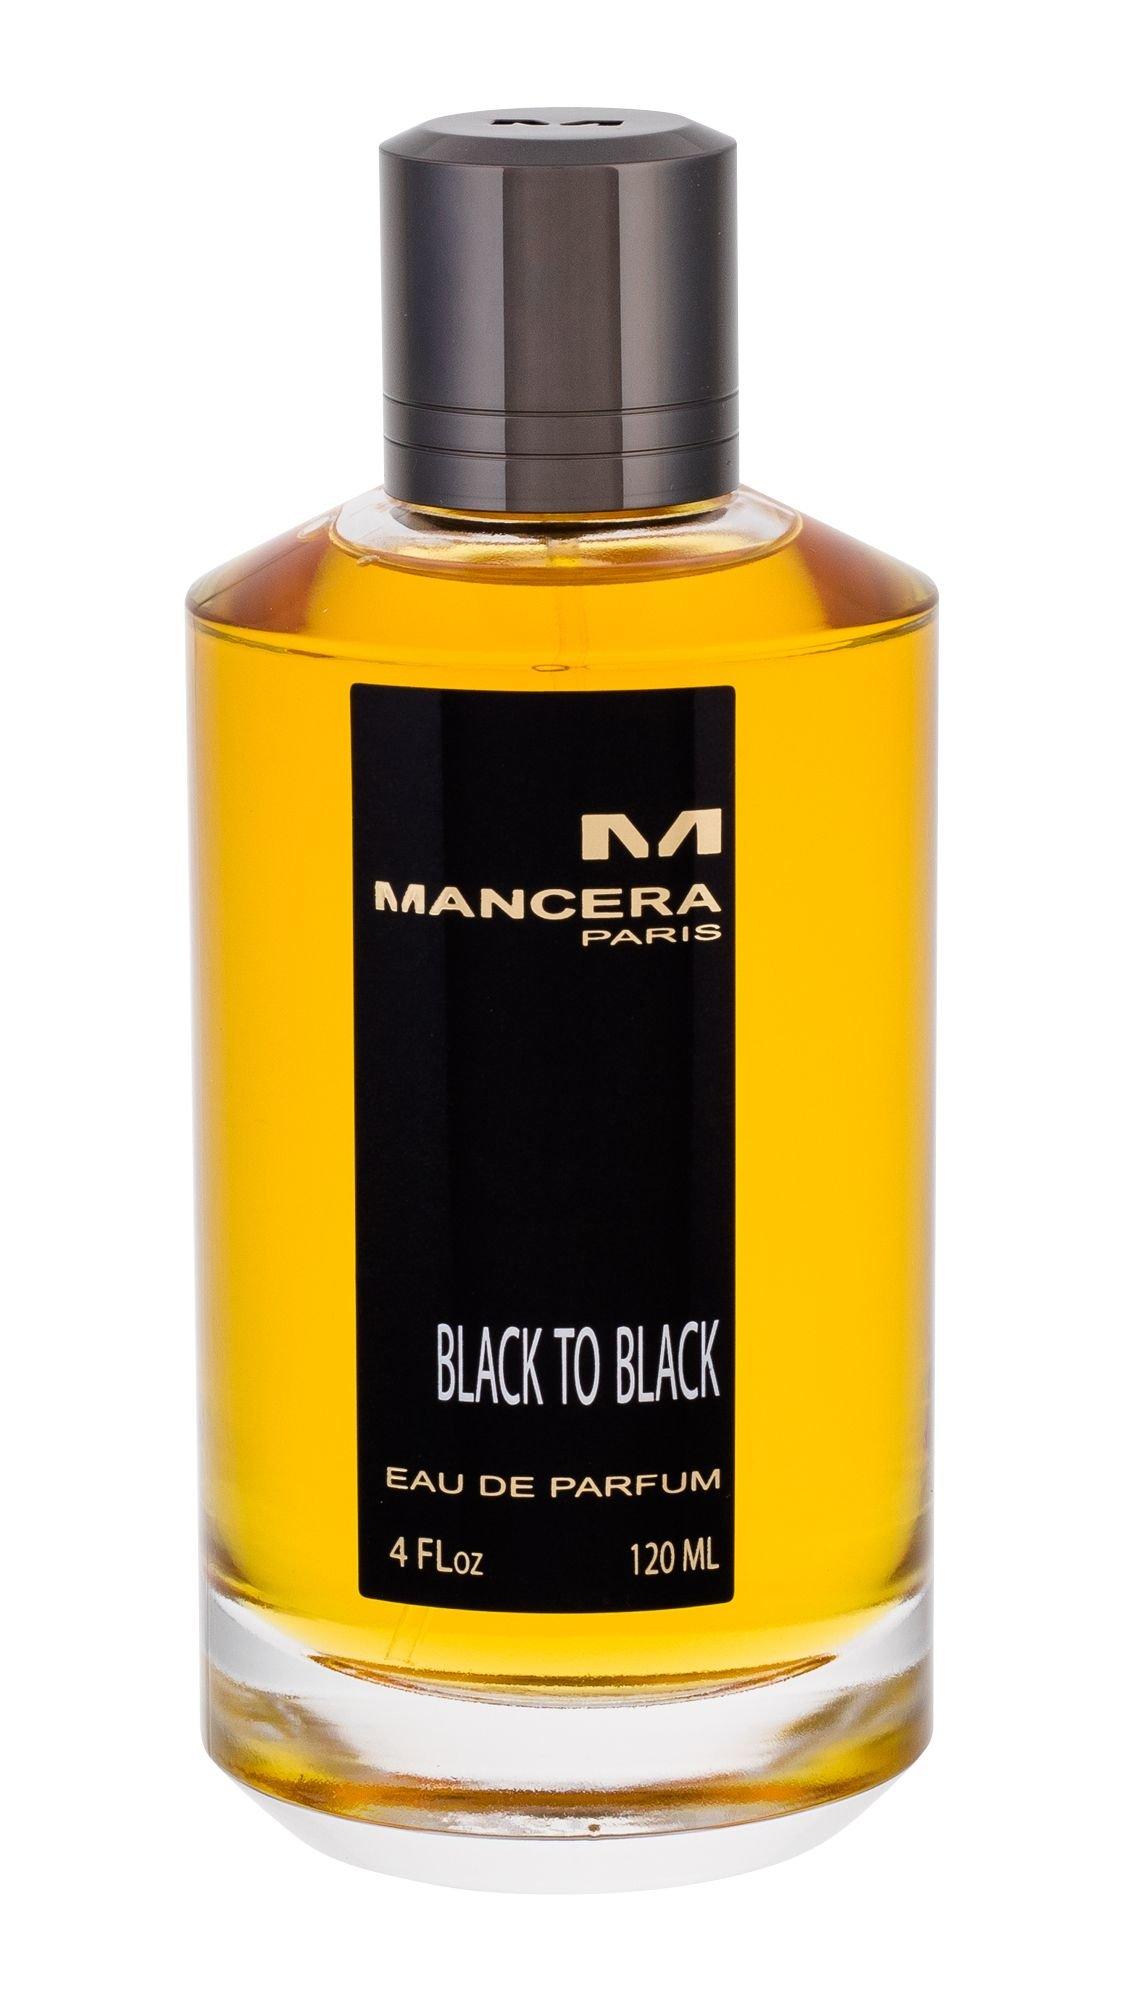 MANCERA Black to Black Eau de Parfum 120ml